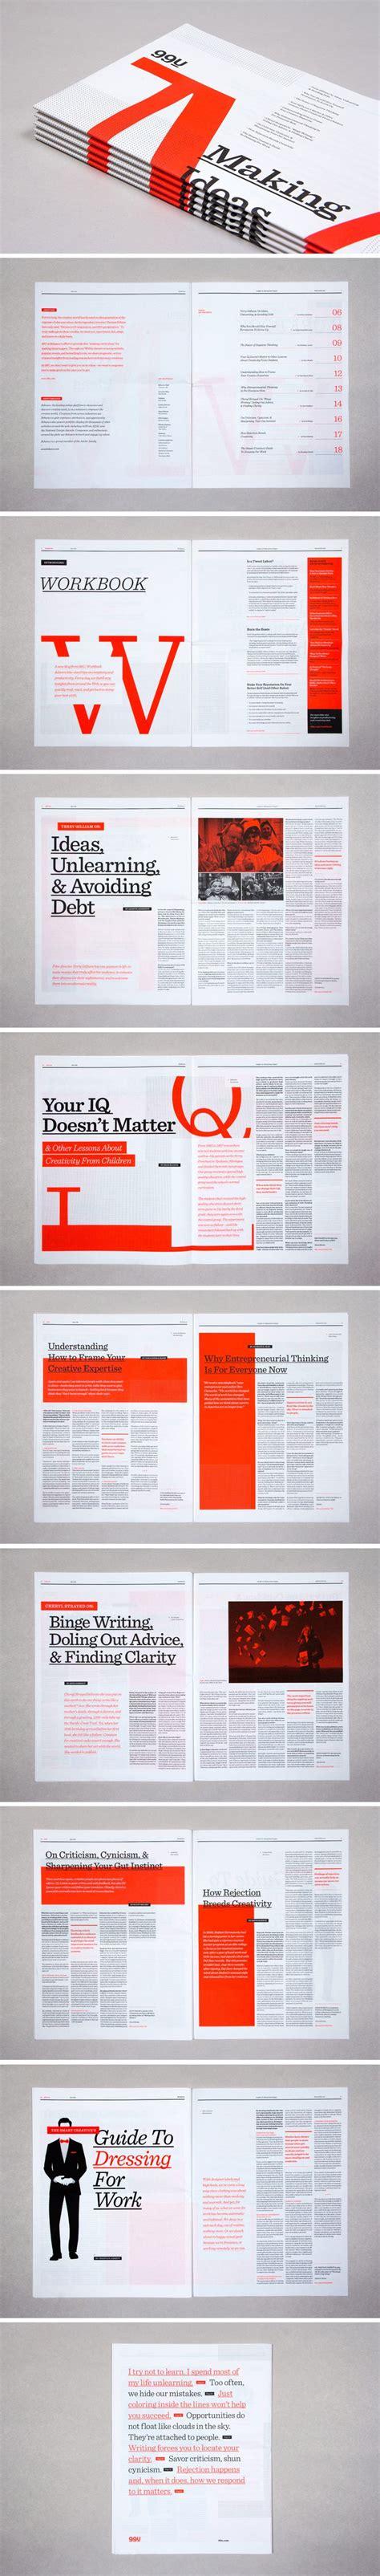 editorial design inspiration pin by gabilab on graphic design inspiration pinterest